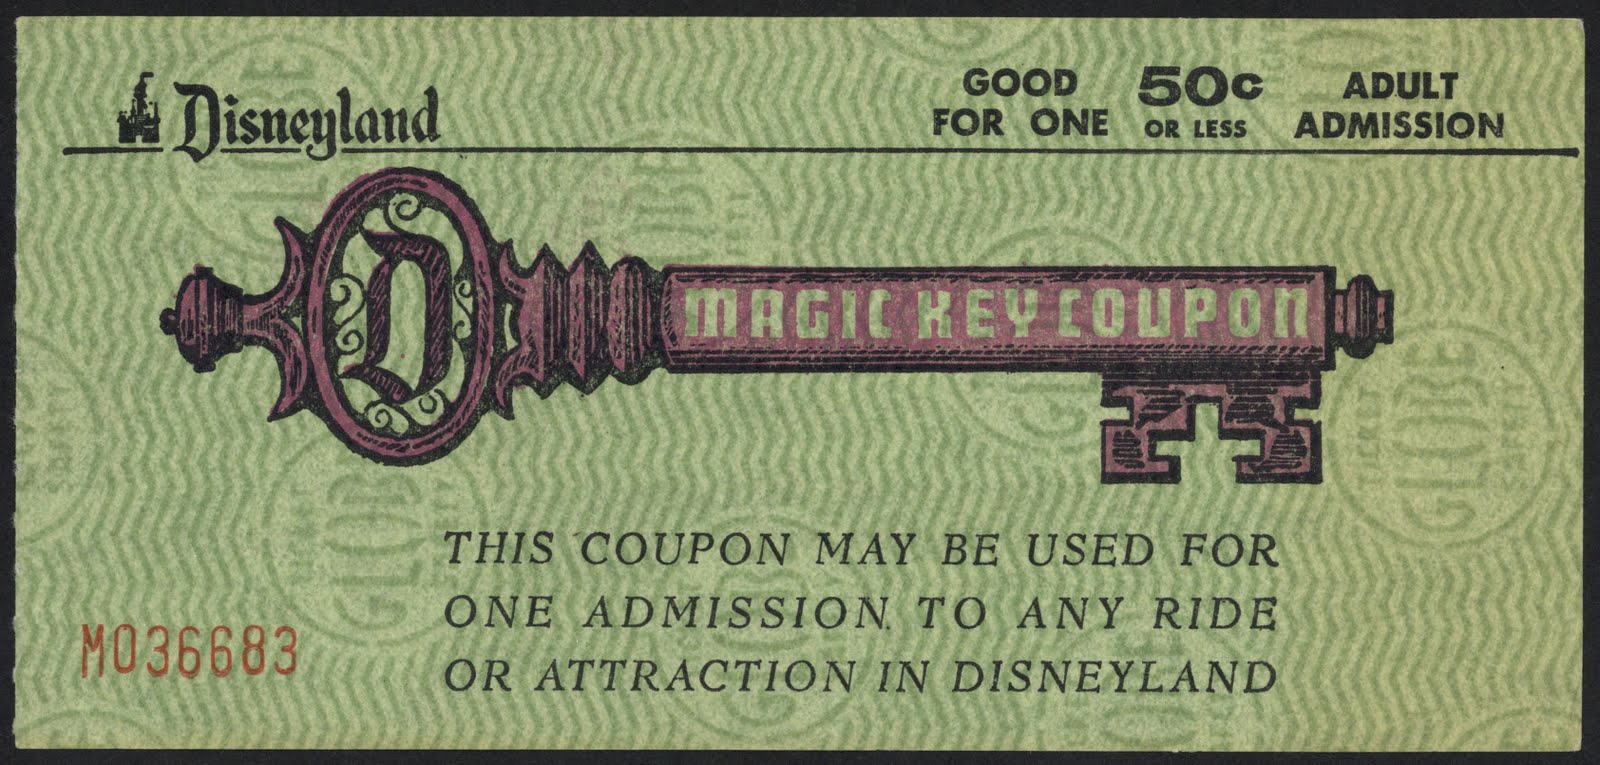 Magic kingdom tickets coupons